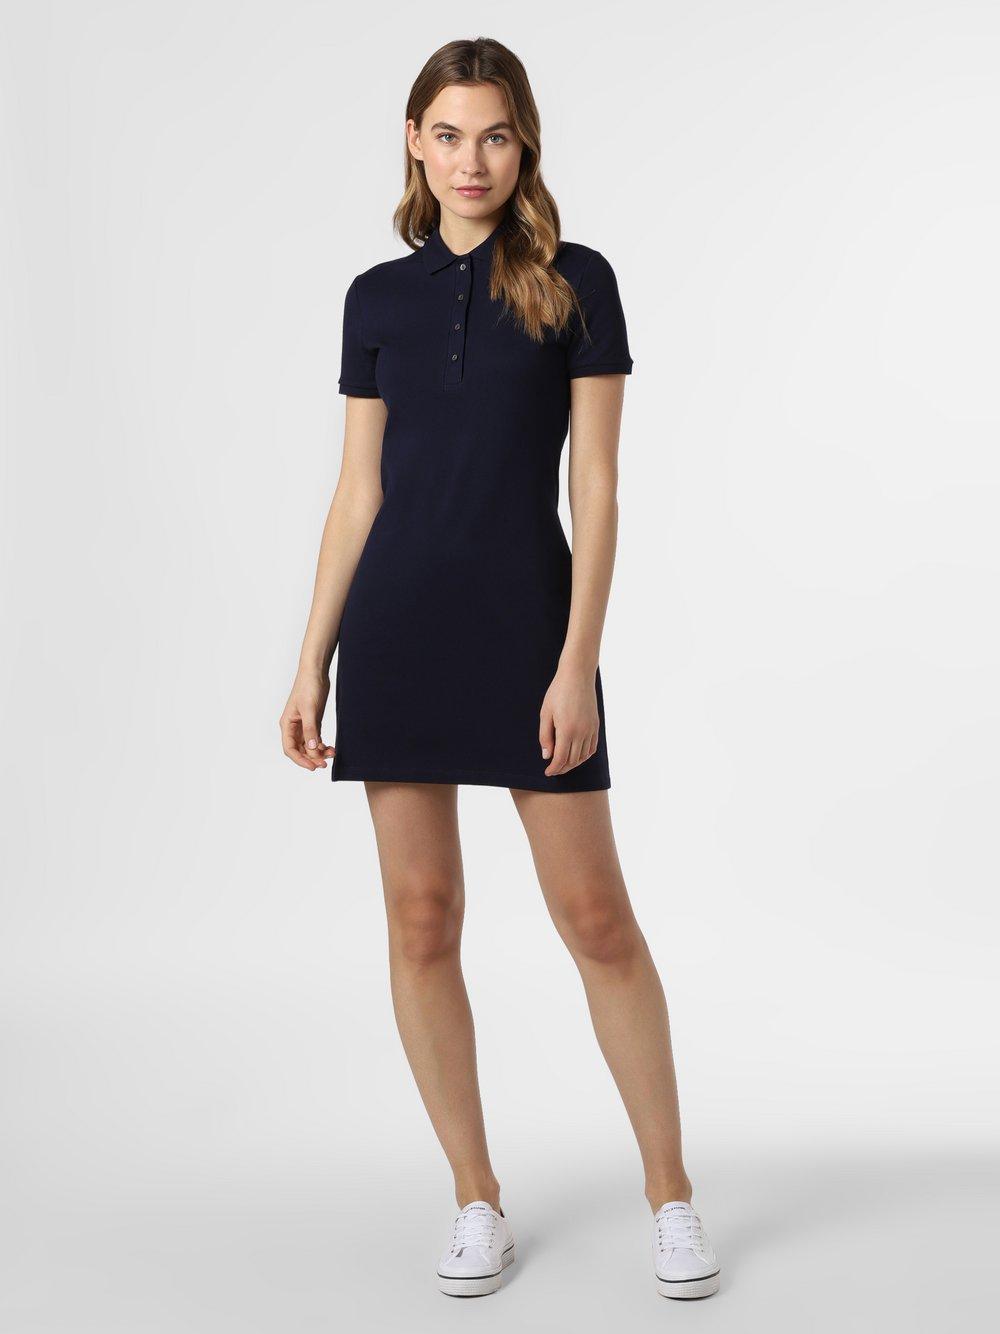 Lacoste - Sukienka damska, niebieski